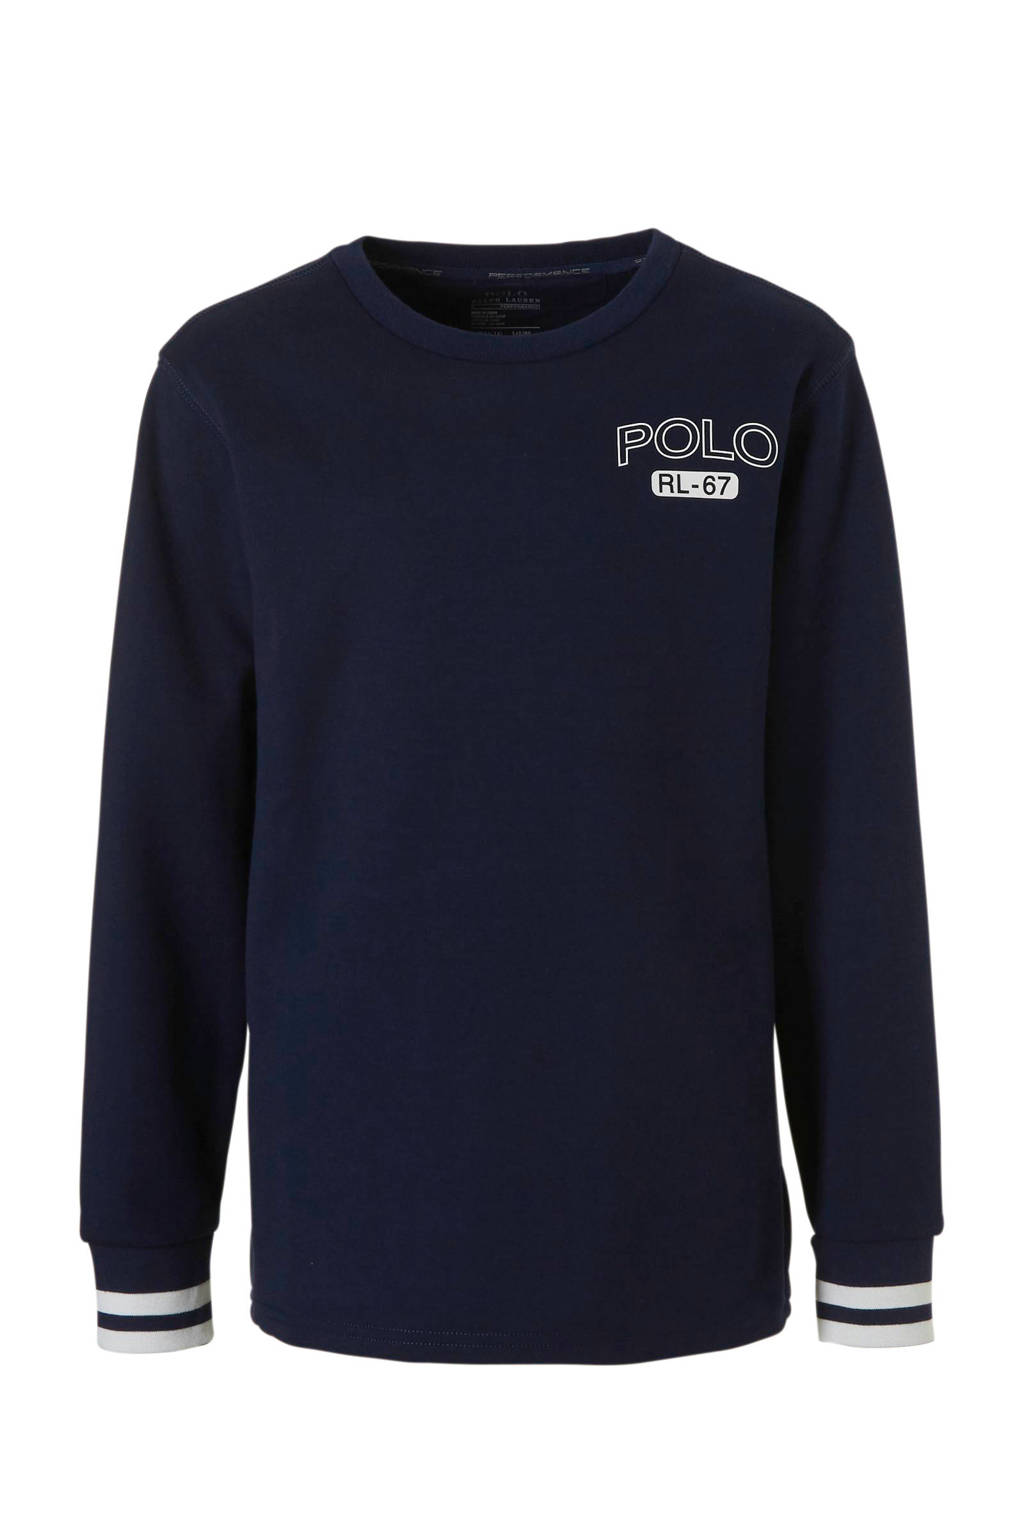 POLO Ralph Lauren sweater met print donkerblauw, Donkerblauw